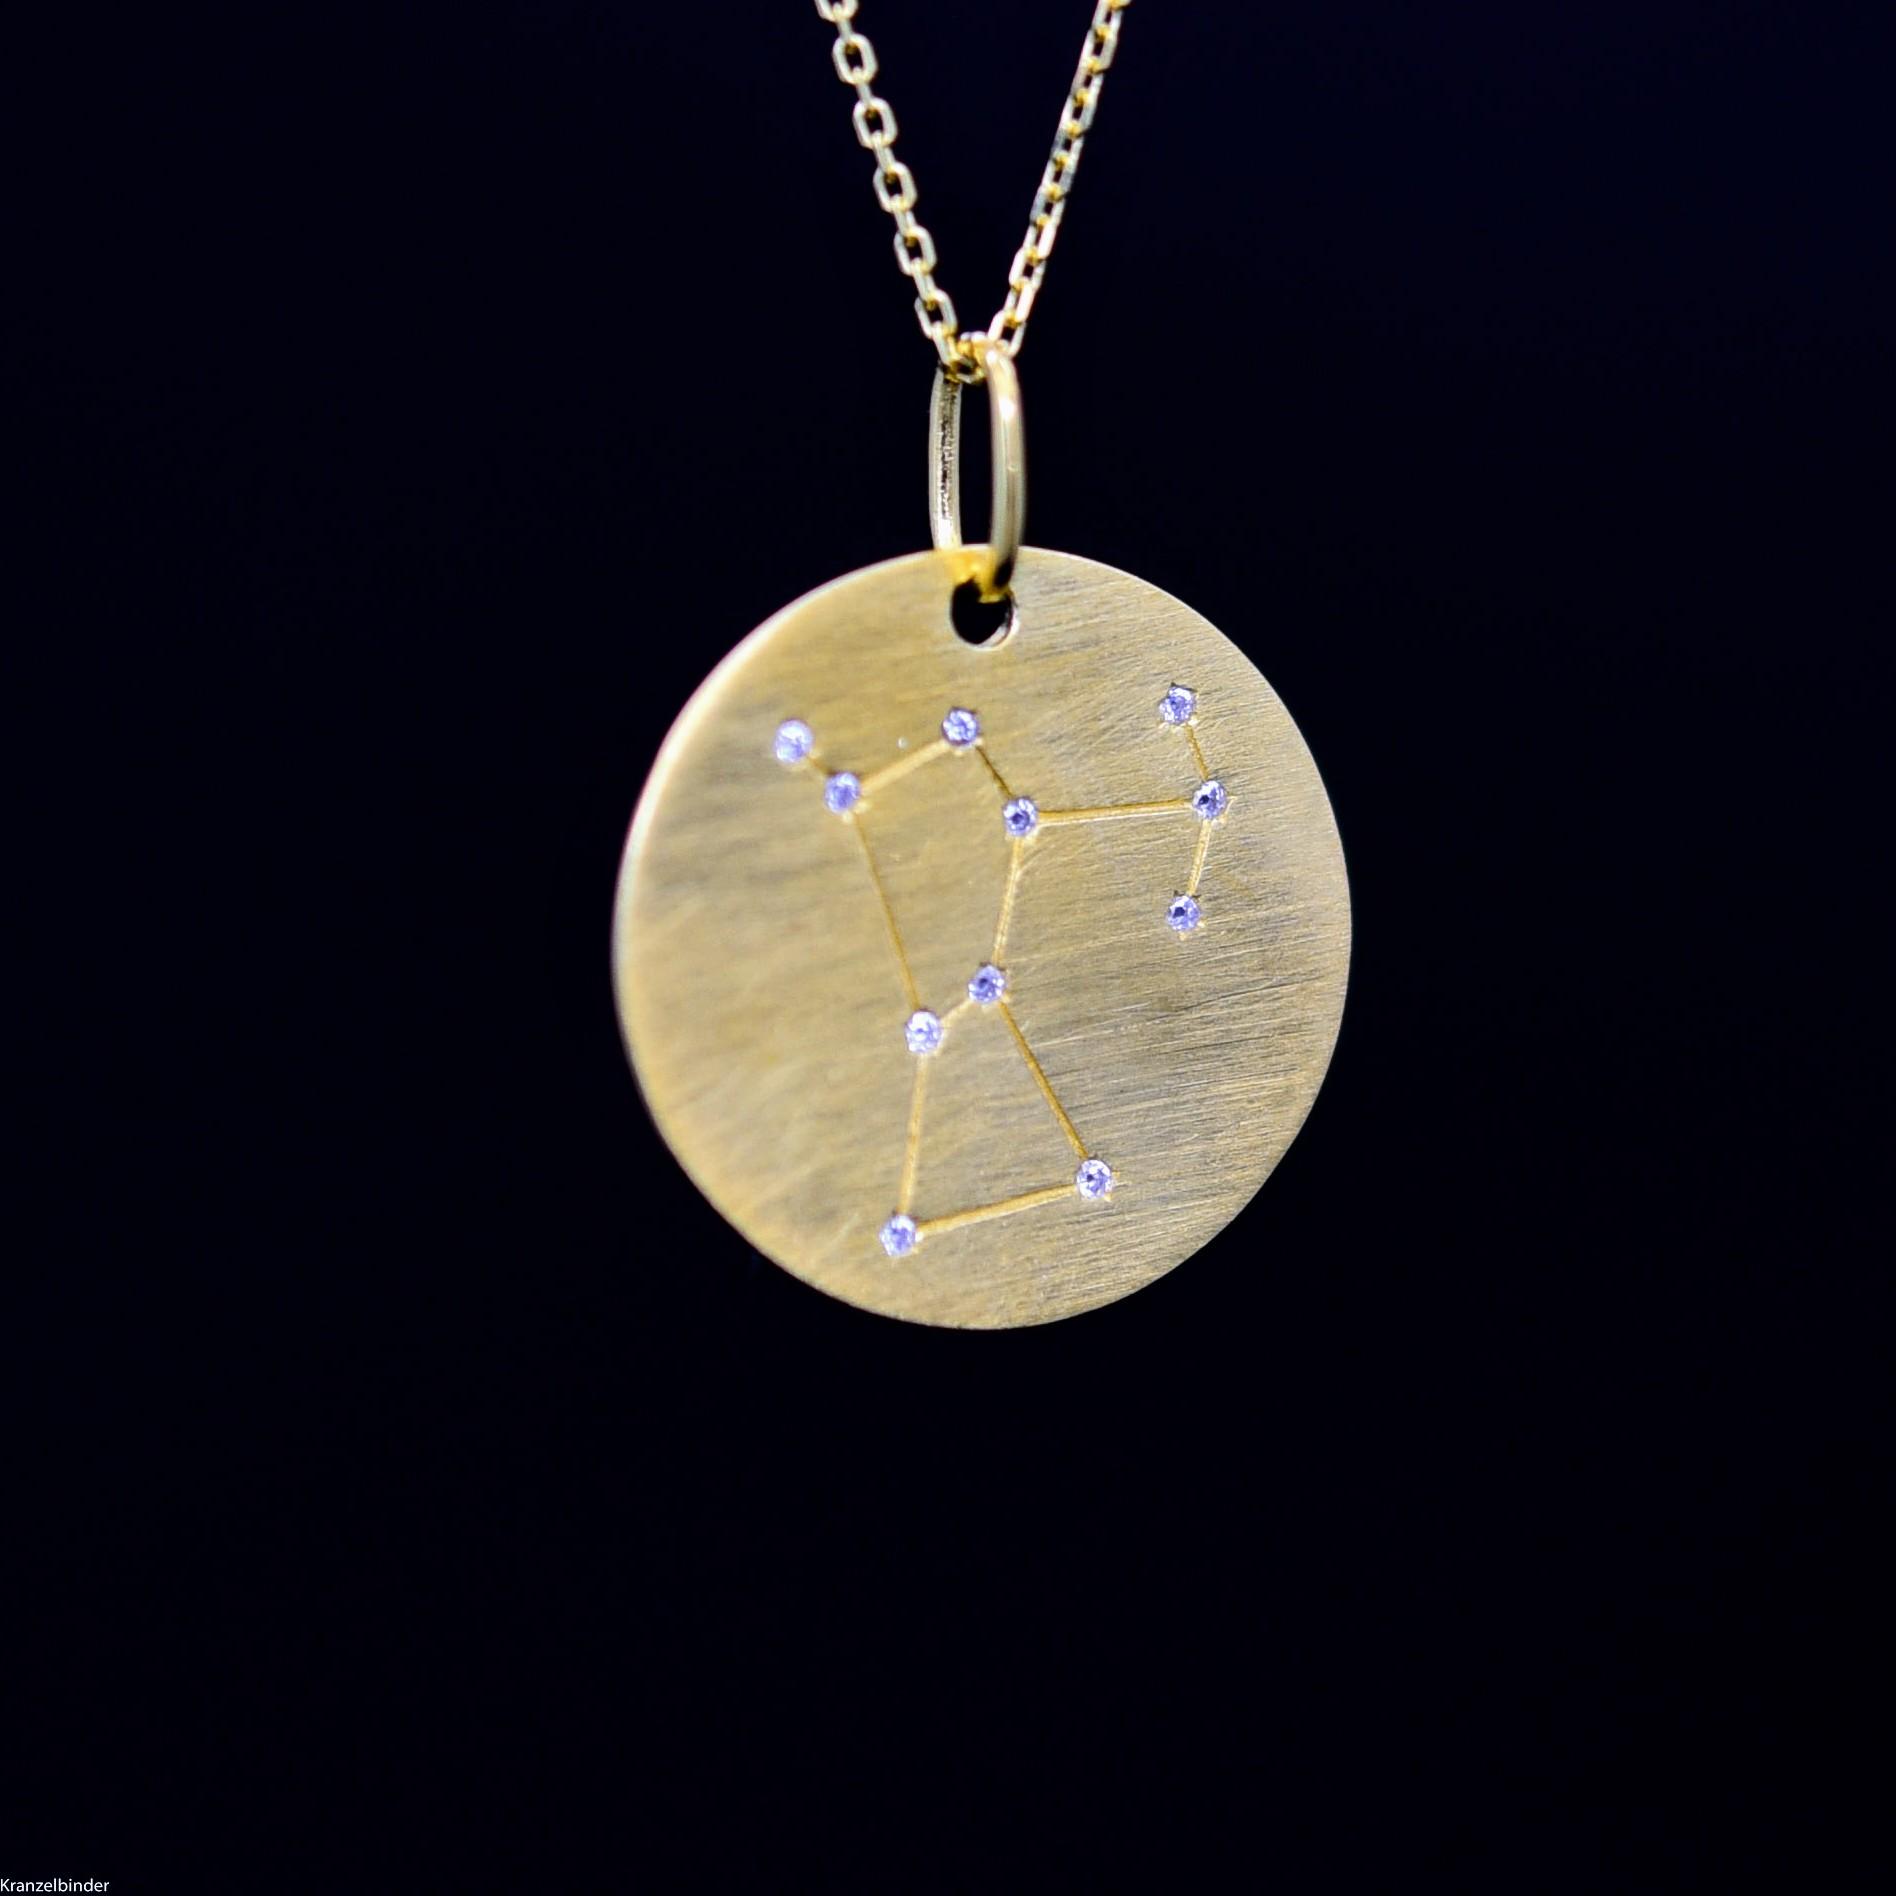 Silberanhänger Sternbild Orion Zirkon